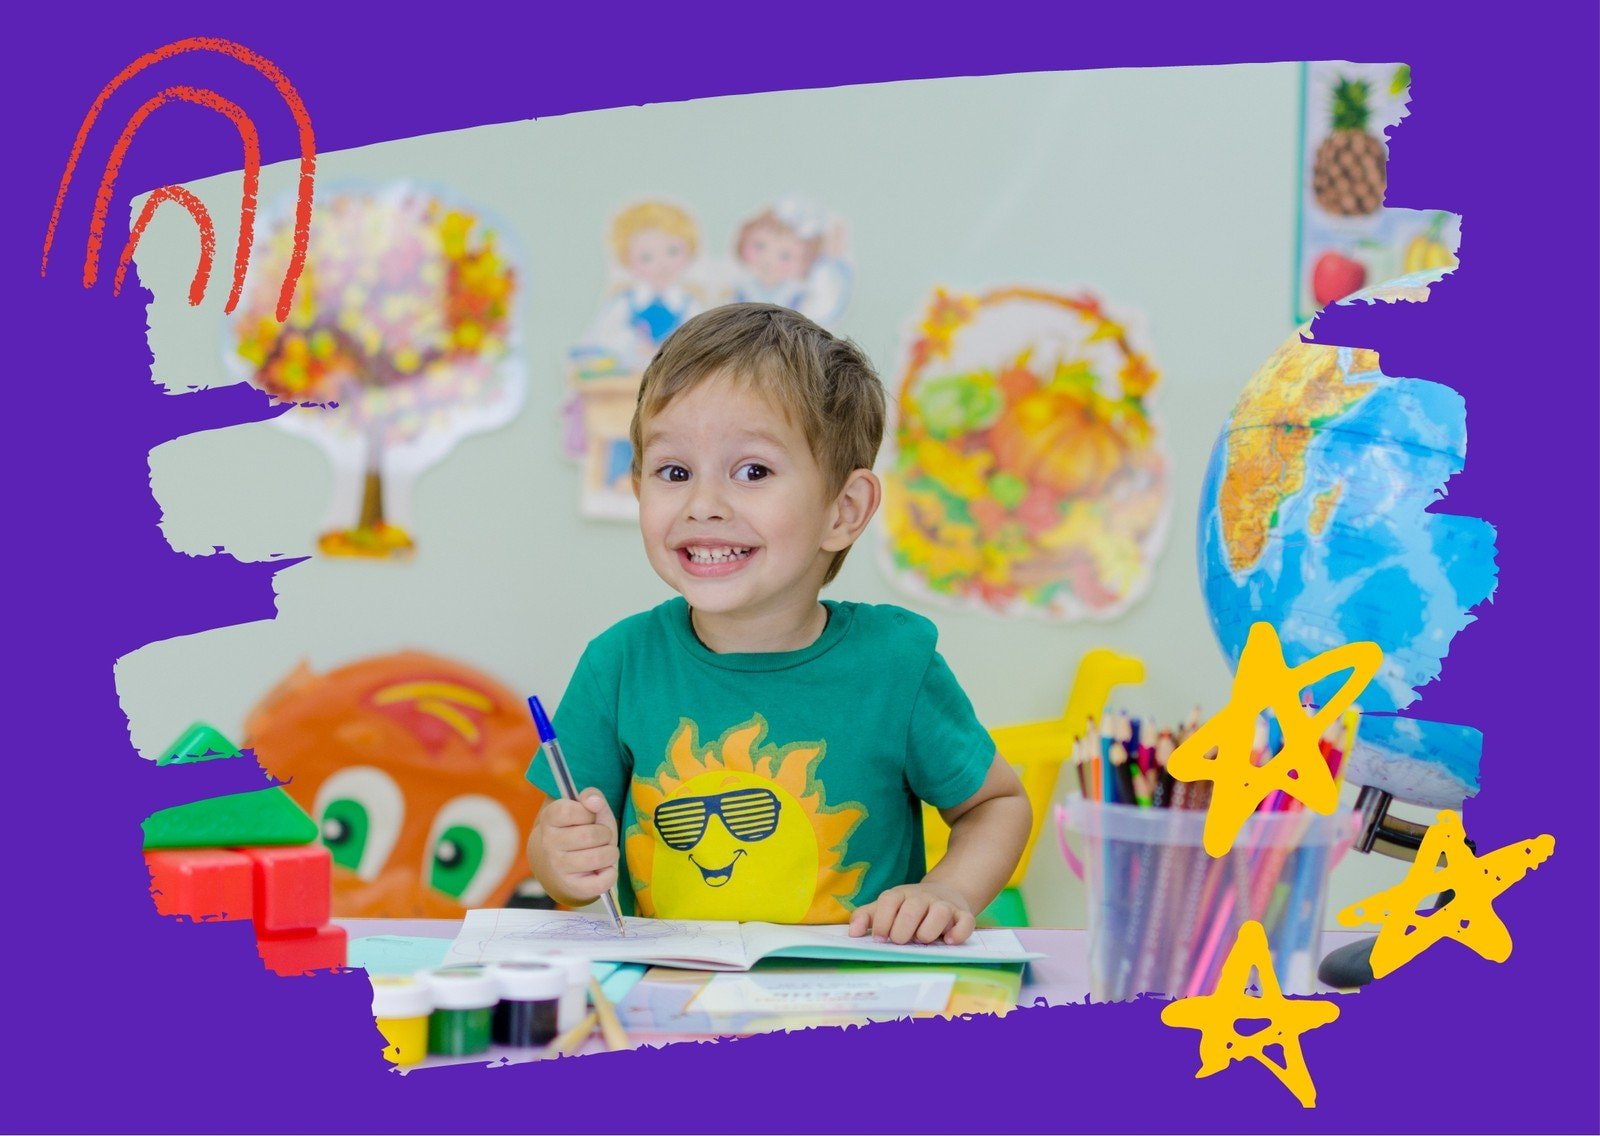 Colorido Infantil Garabatos Postal de Vínculos Infantiles